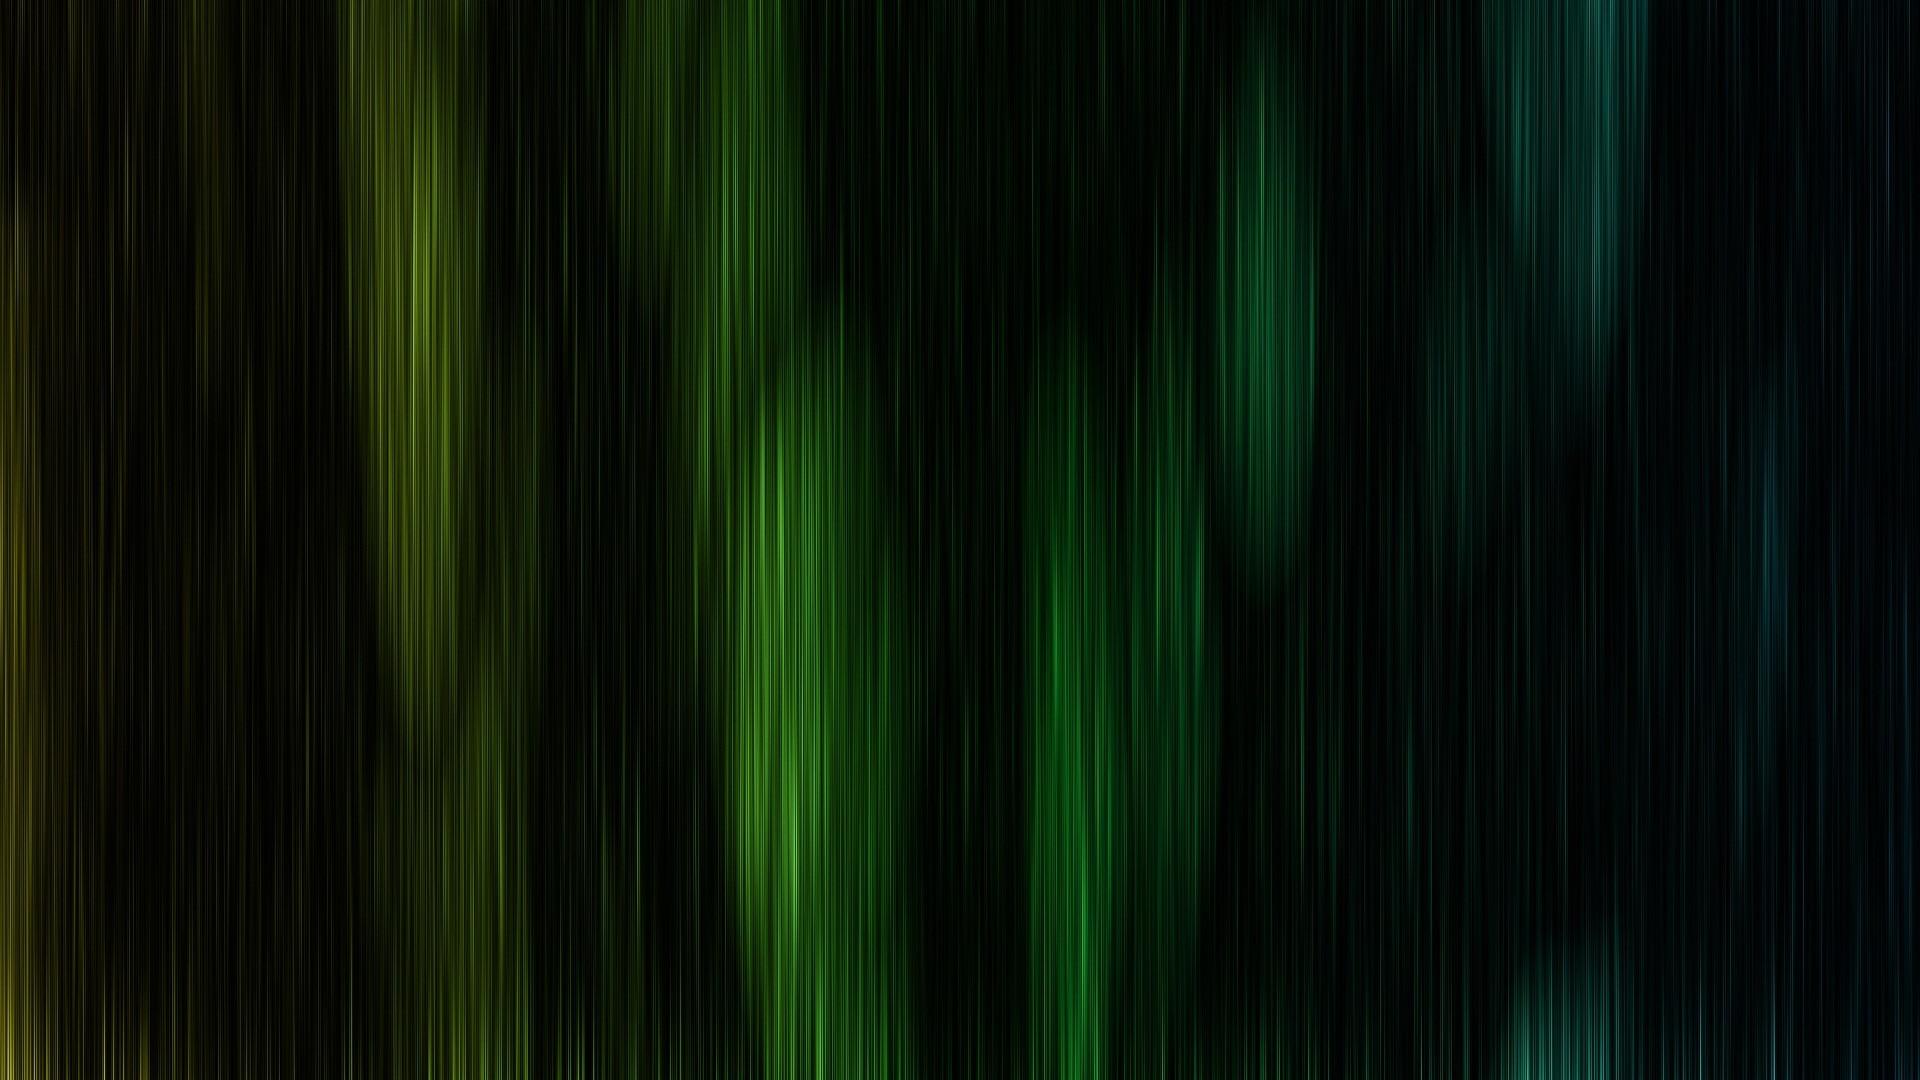 Green Water Bubbles Wallpapers – https://hdwallpapersf.com/green -water-bubbles-wallpapers | HDWallpapersf latest Post | Pinterest |  Wallpaper